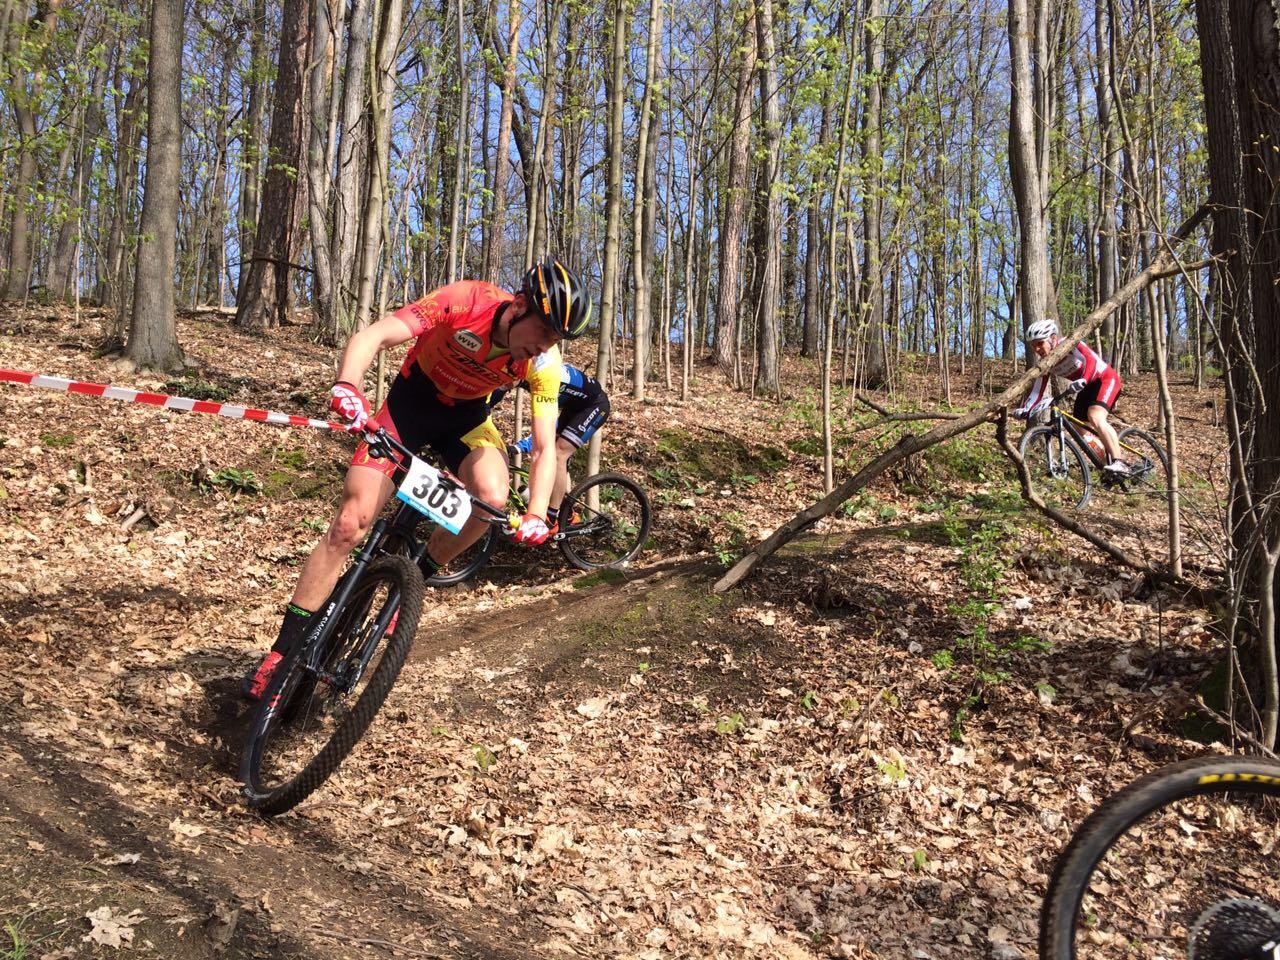 09.04.2017 MDC-XC-Rennen, Bautzen | Team Firebike Handelshof